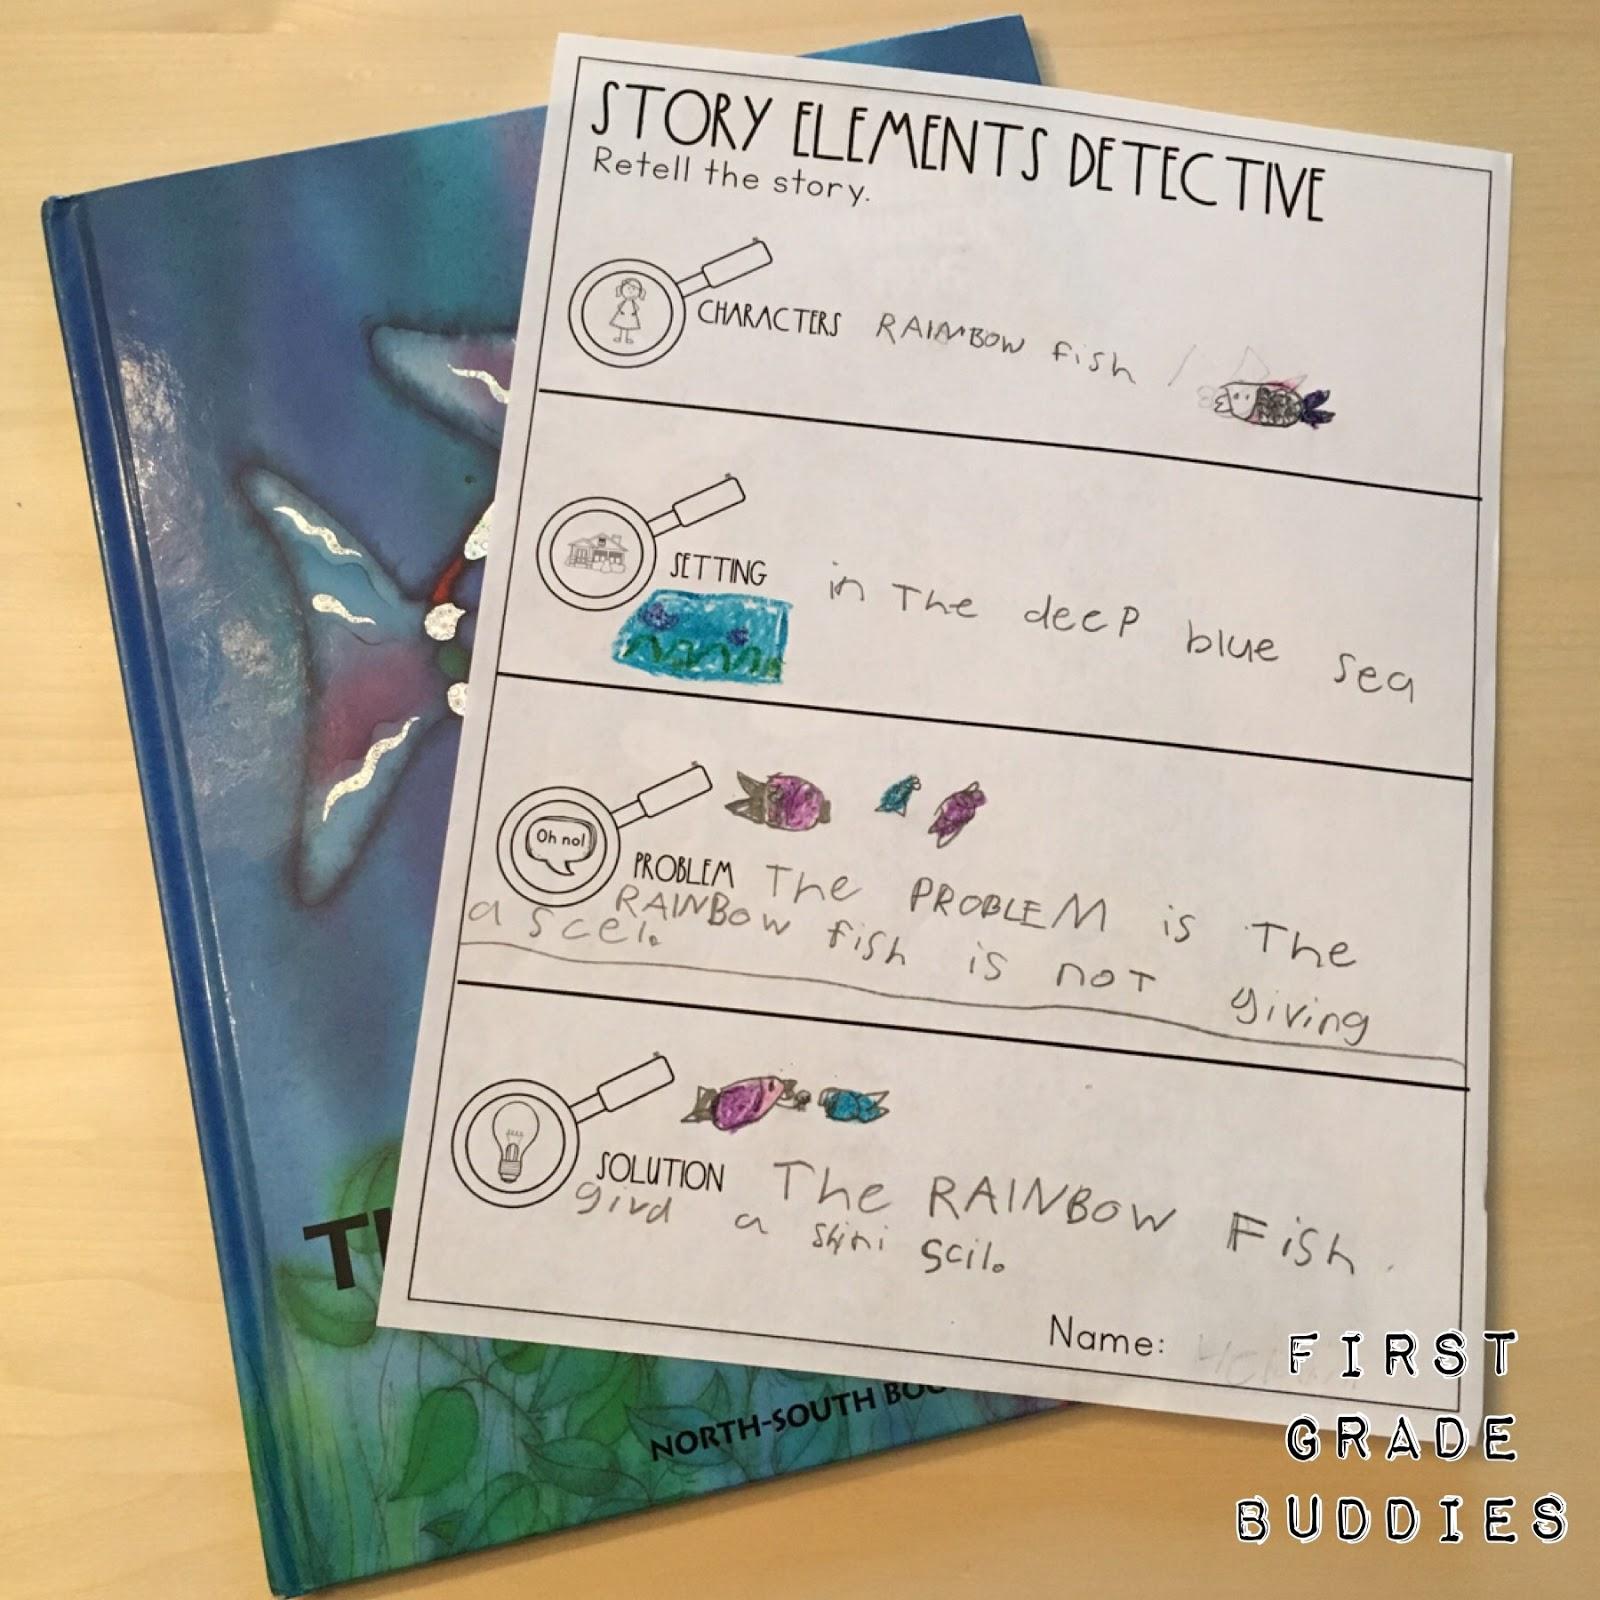 Story Elements Detective